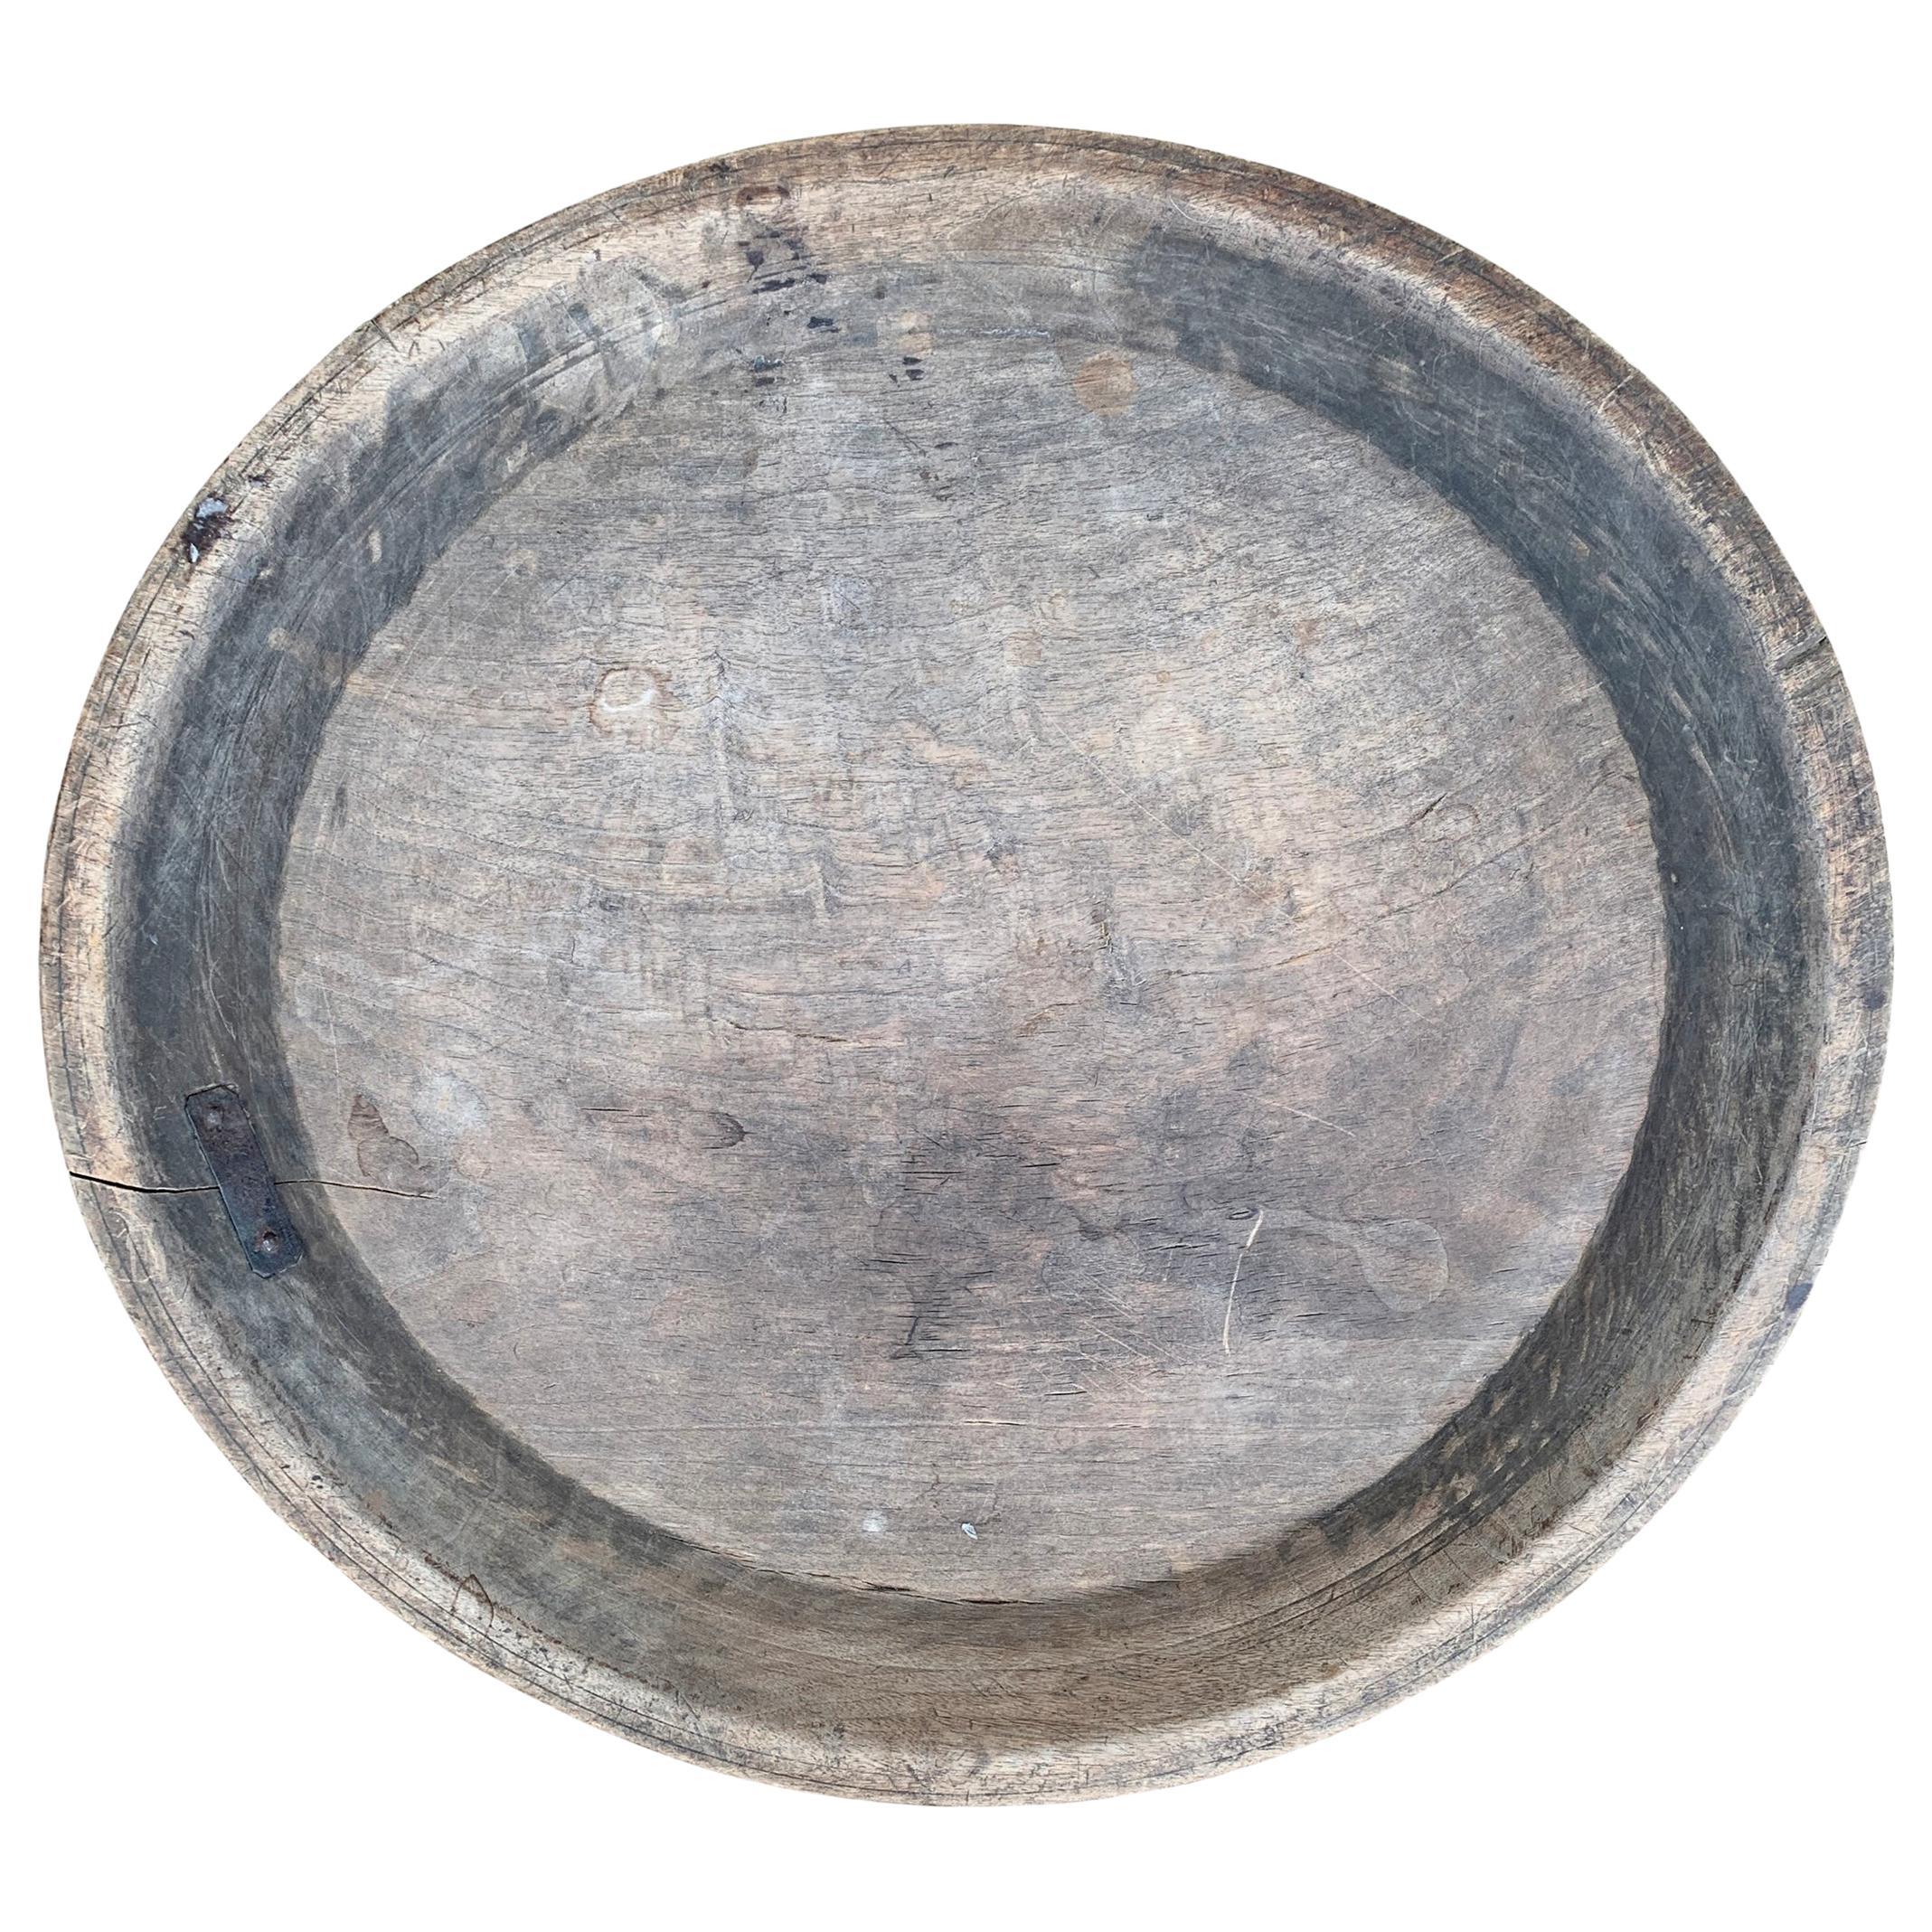 18th Century American Turned Wood Platter